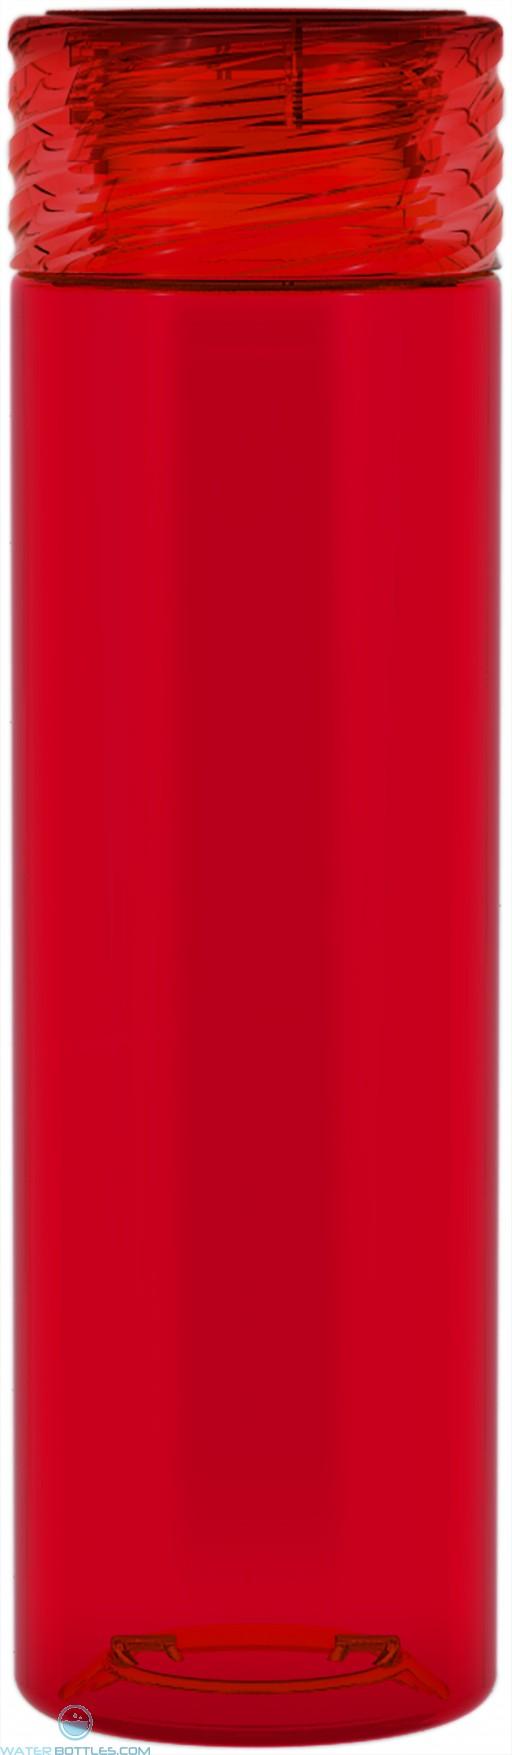 32 oz H2Go Tornado Bottle_Red_Blank